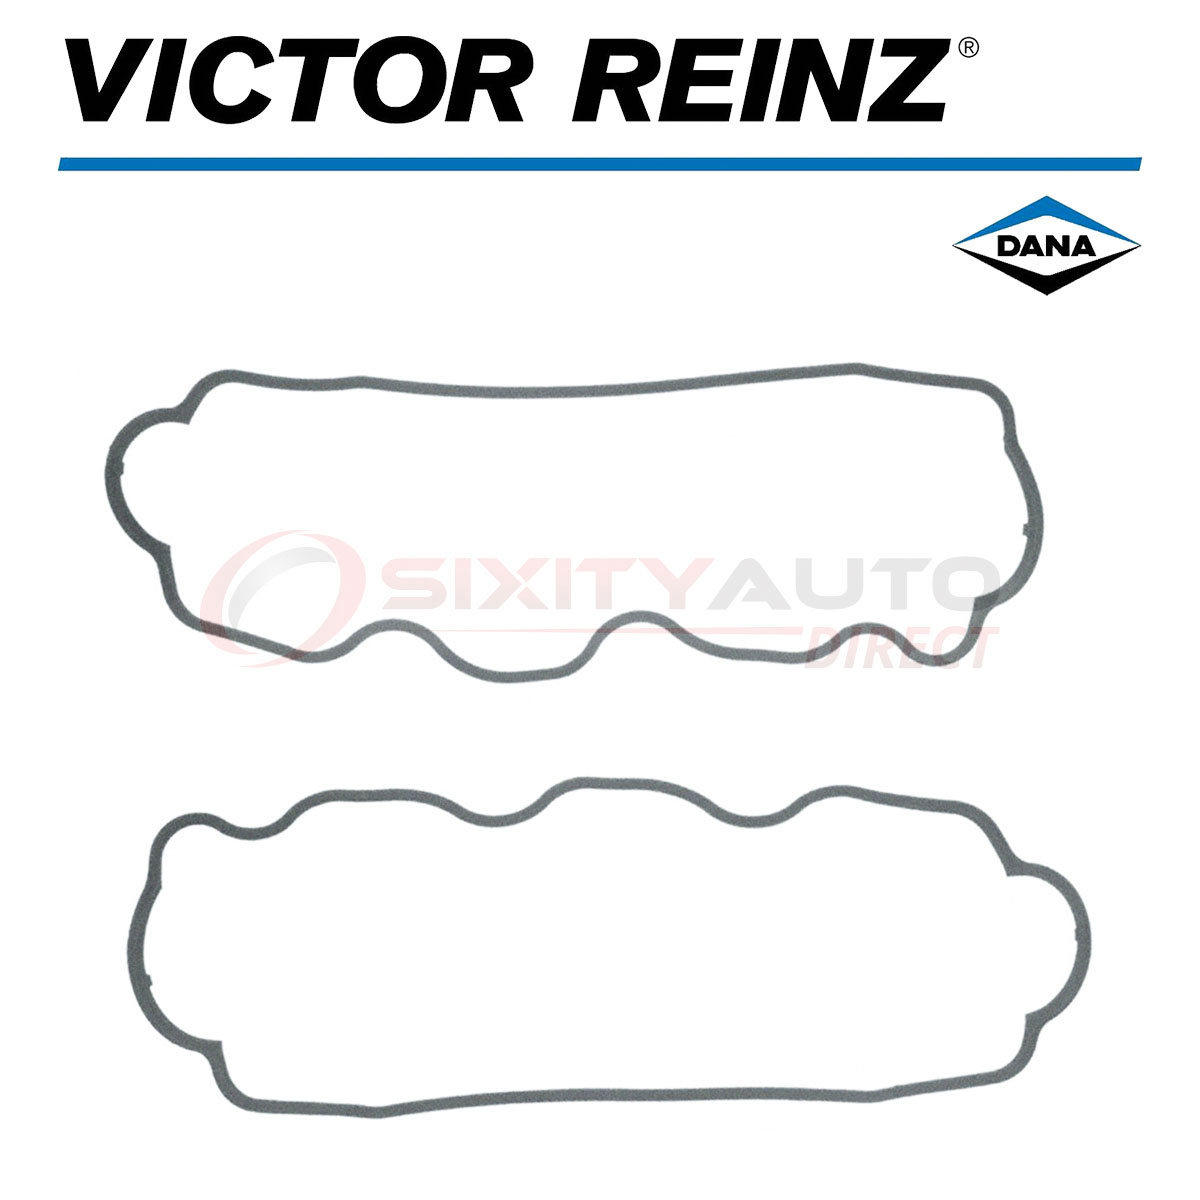 Victor Reinz Valve Cover Gasket Set For Mitsubishi